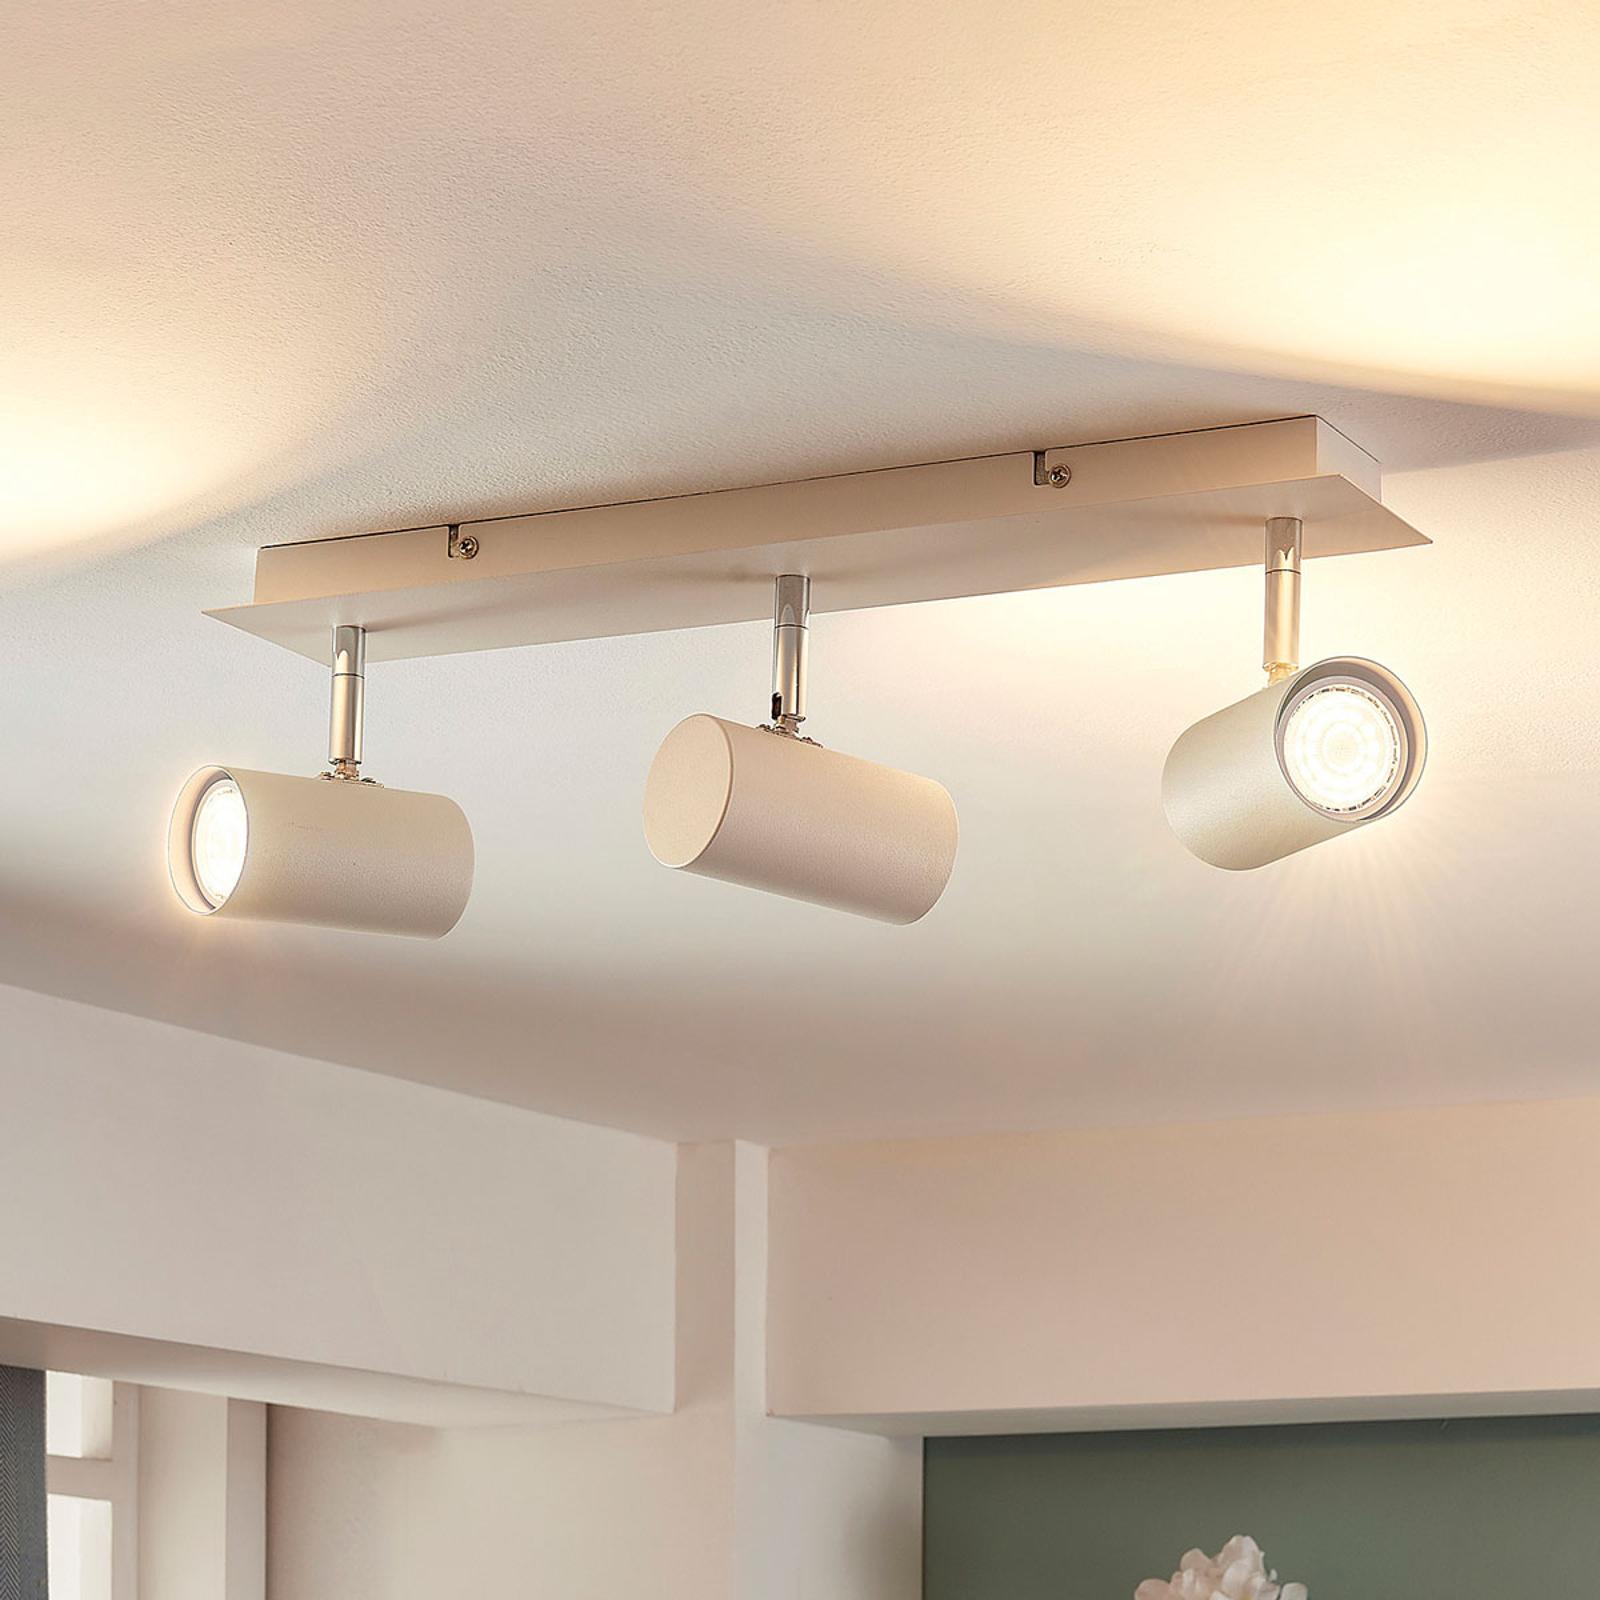 Dreiflammige LED-Deckenlampe Iluk in Weiß